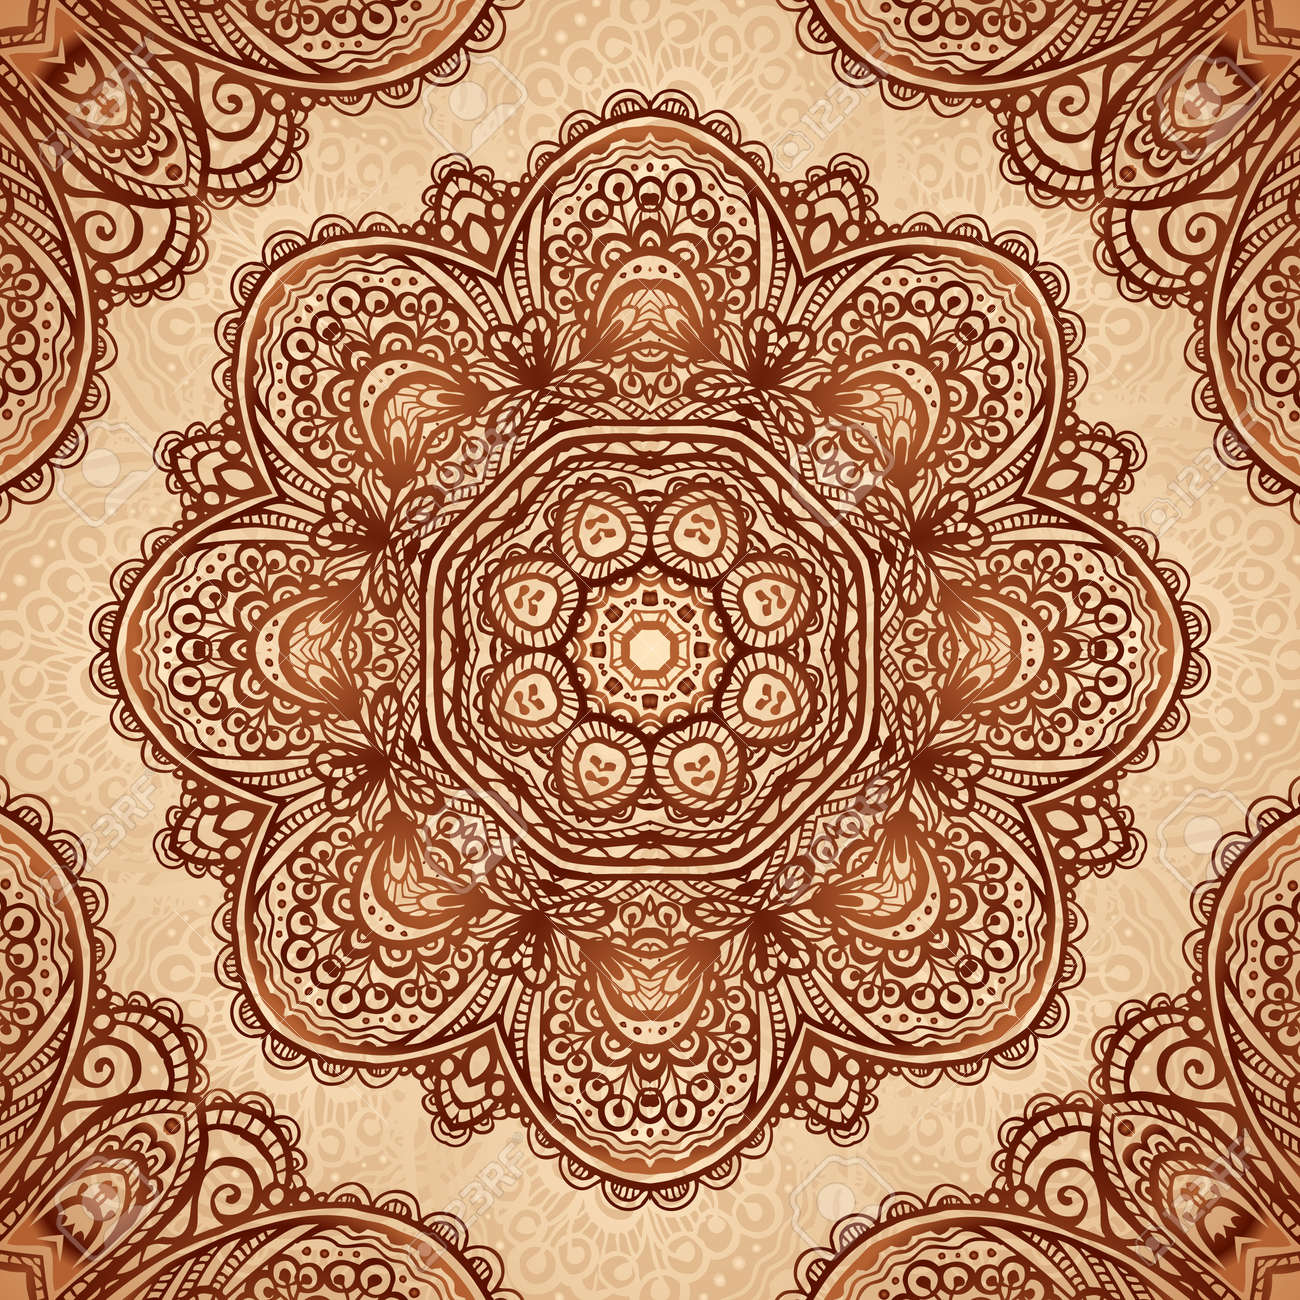 Ornate vintage vector background in mehndi style royalty free stock - Ornate Vintage Napkin Background In Indian Mehndi Style Stock Vector 20723095